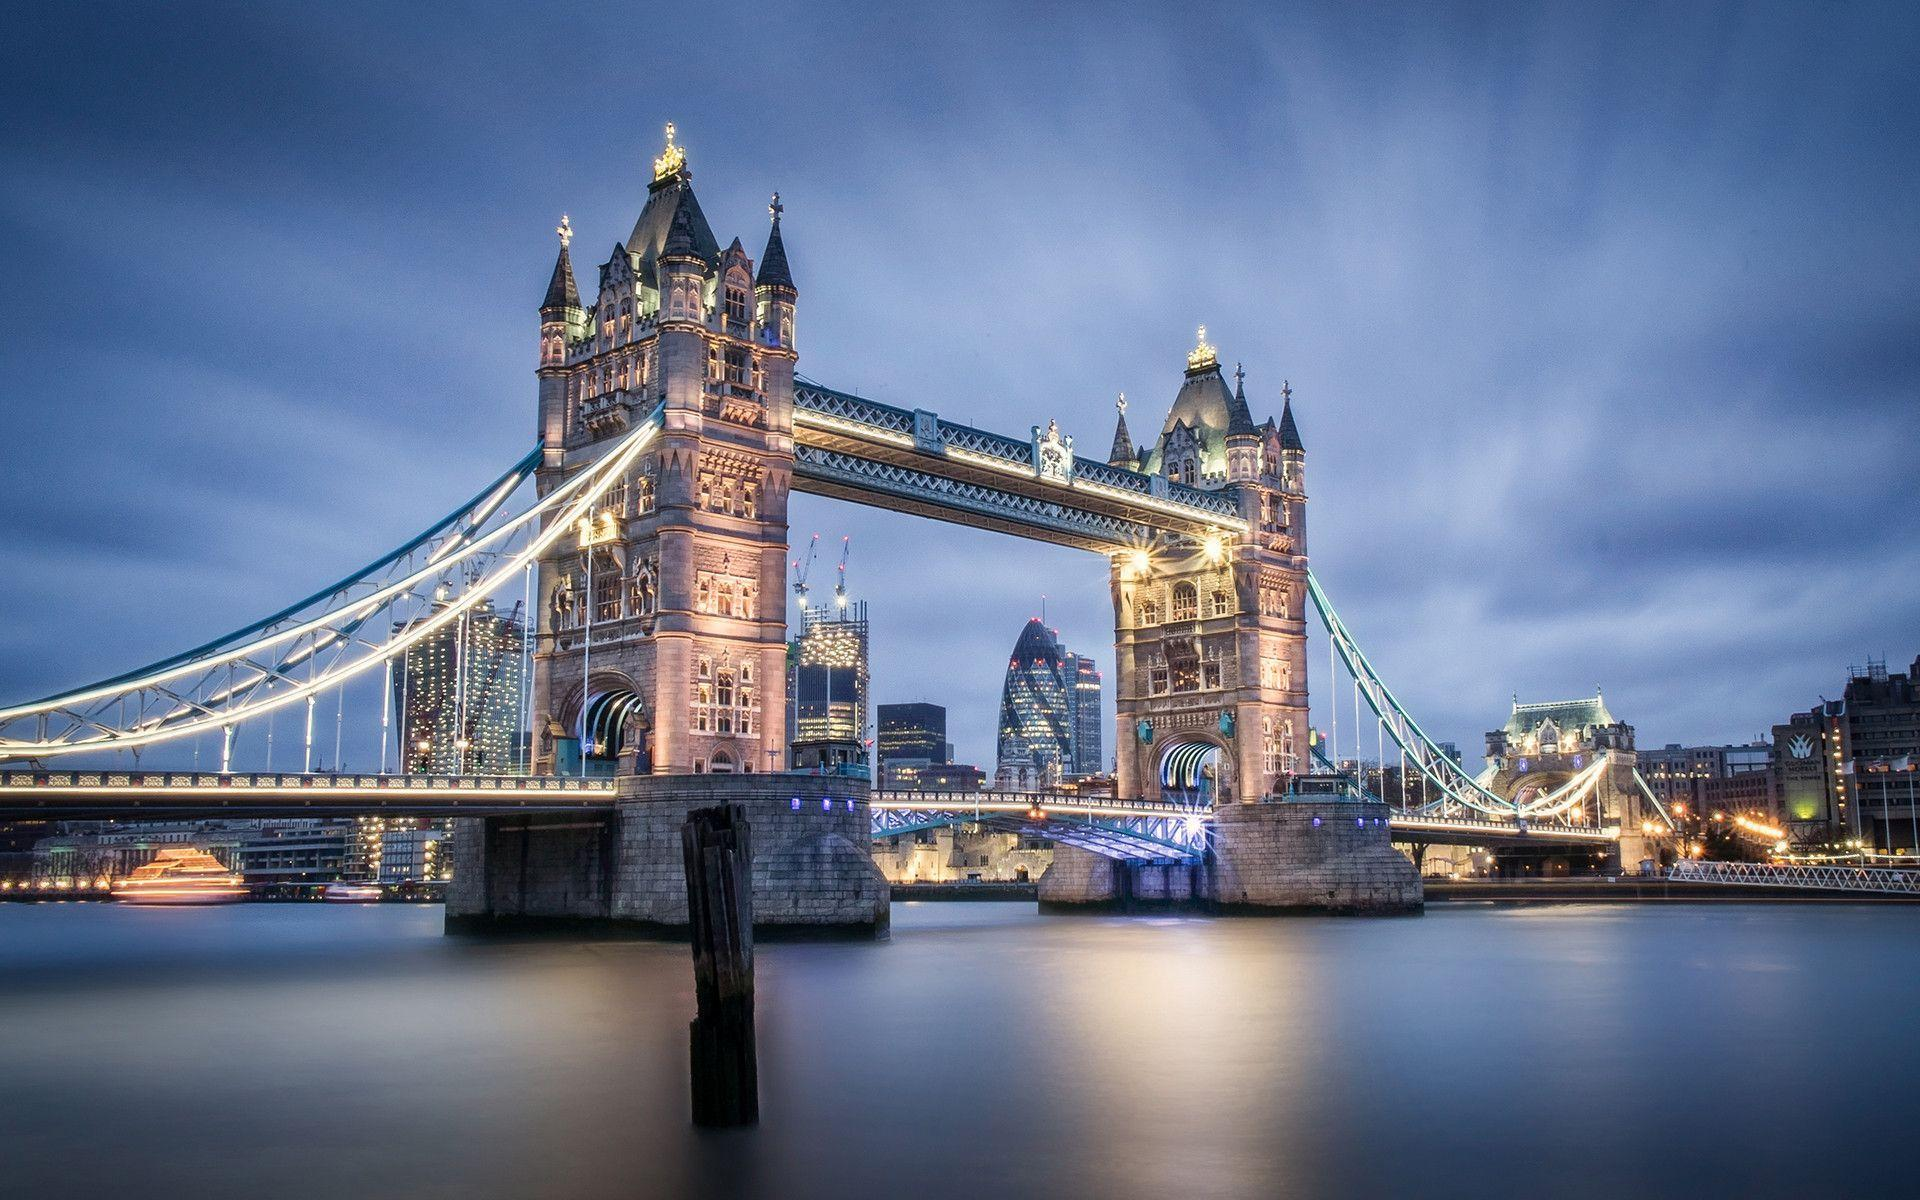 london hd images - photo #40